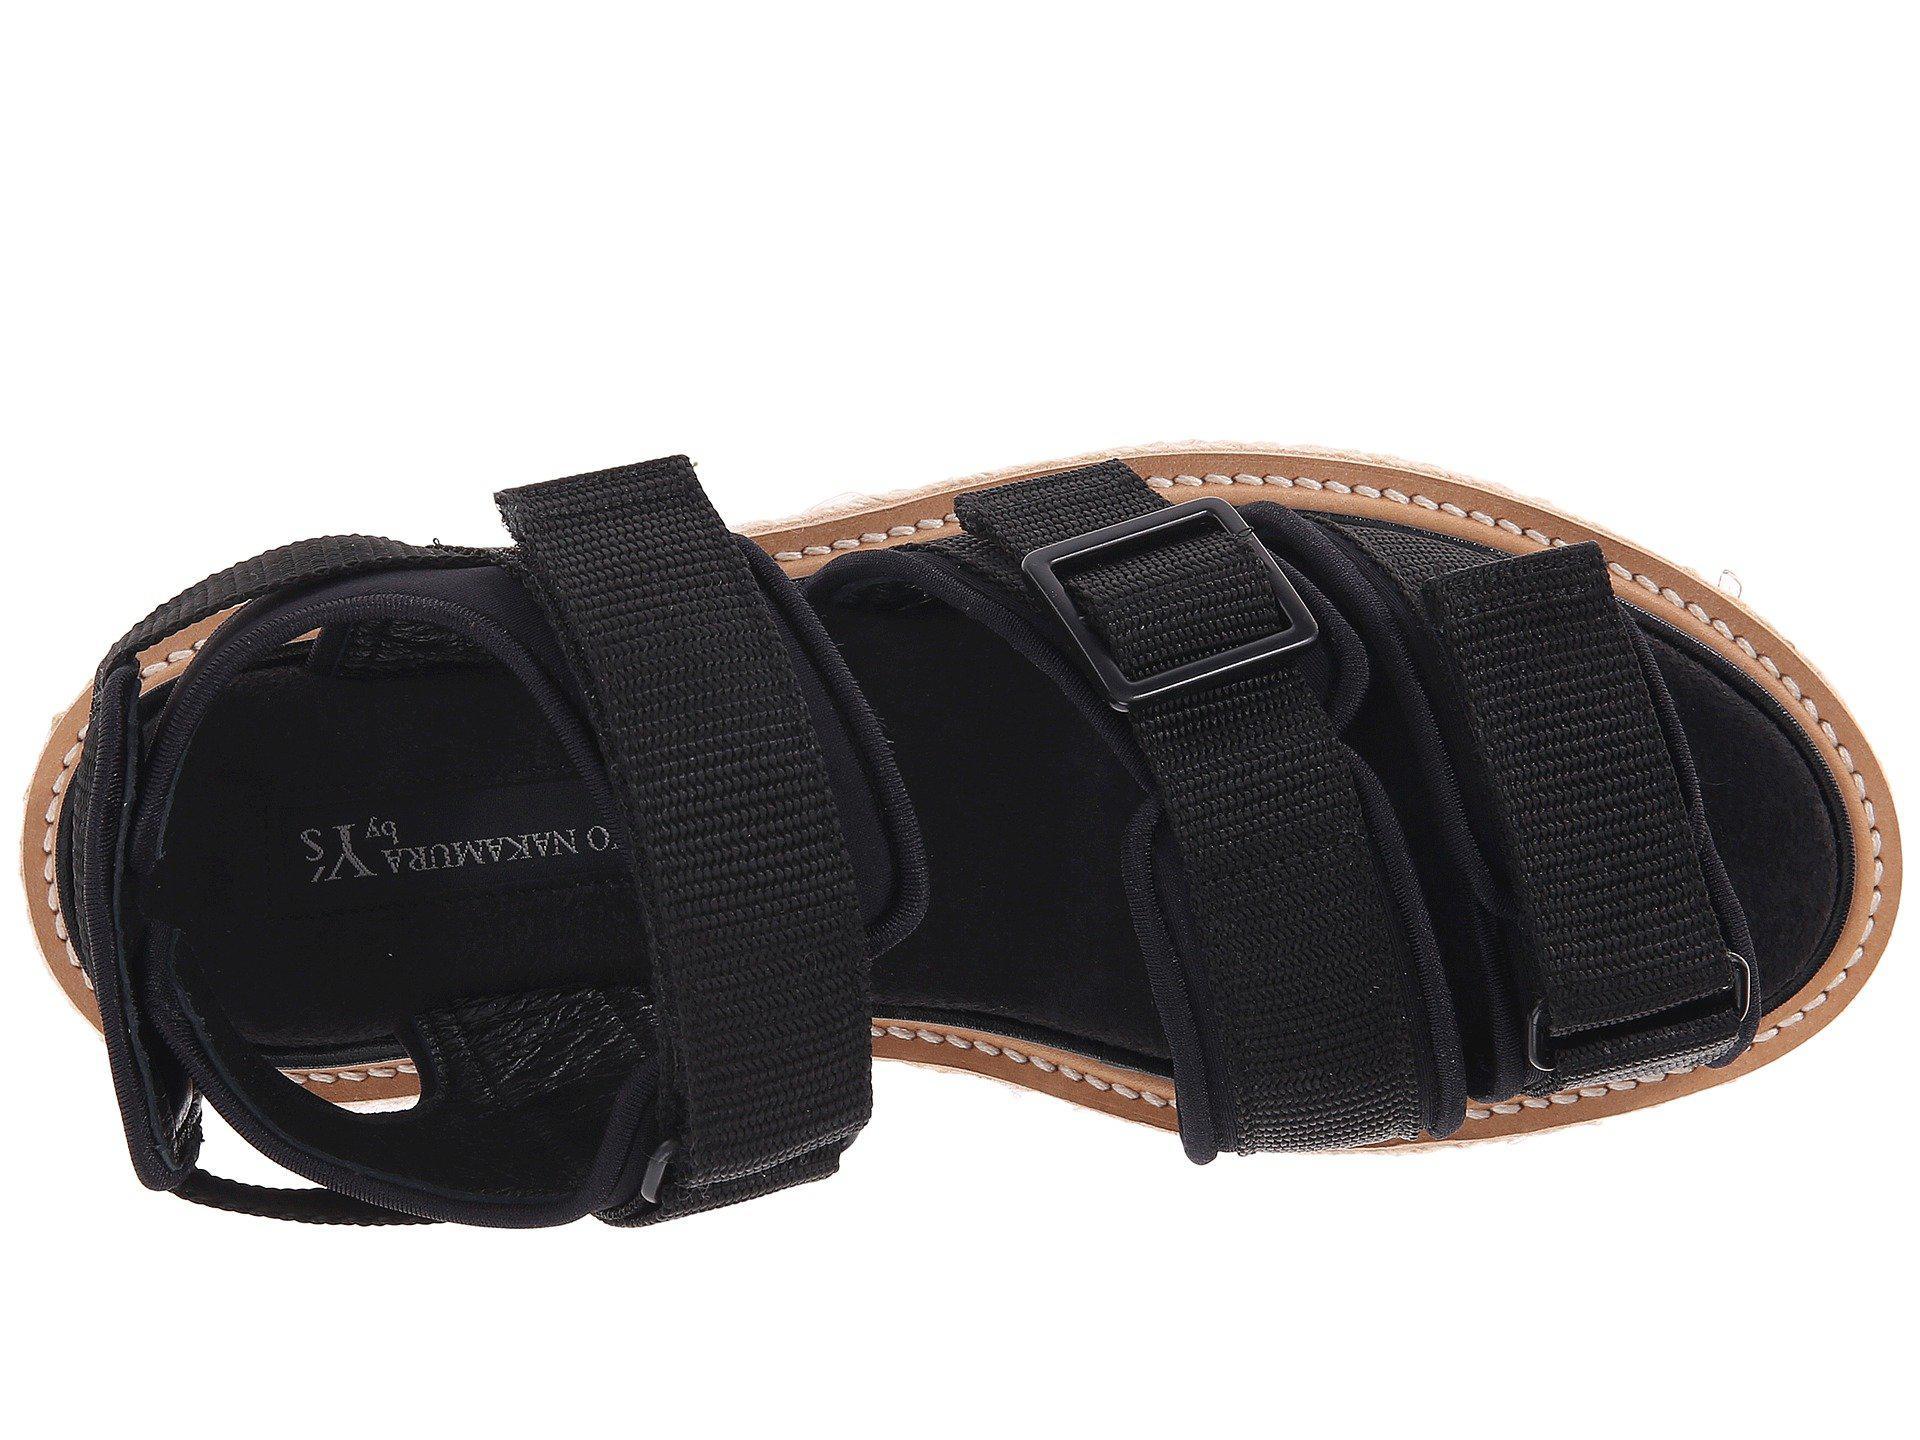 8f8d73b39 Lyst - Y s Yohji Yamamoto Shark Strap Sandals in Black